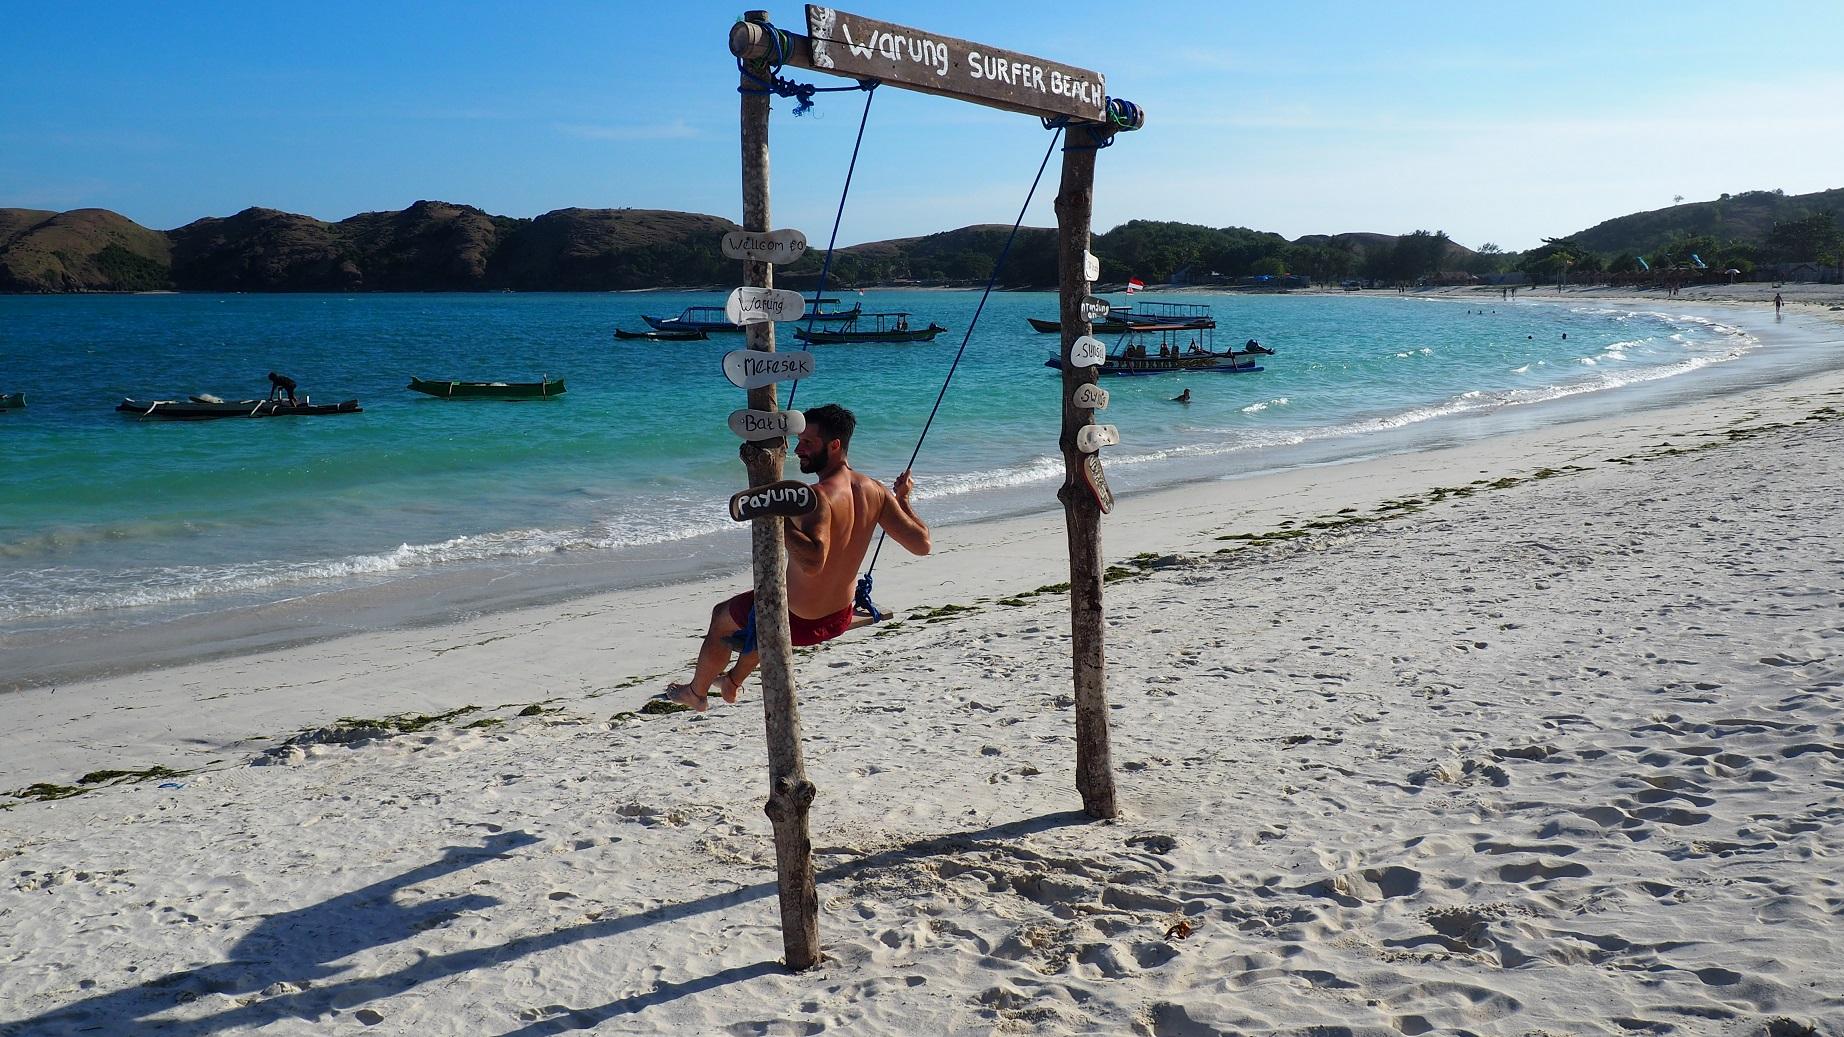 lombok-bali-interesante-orte